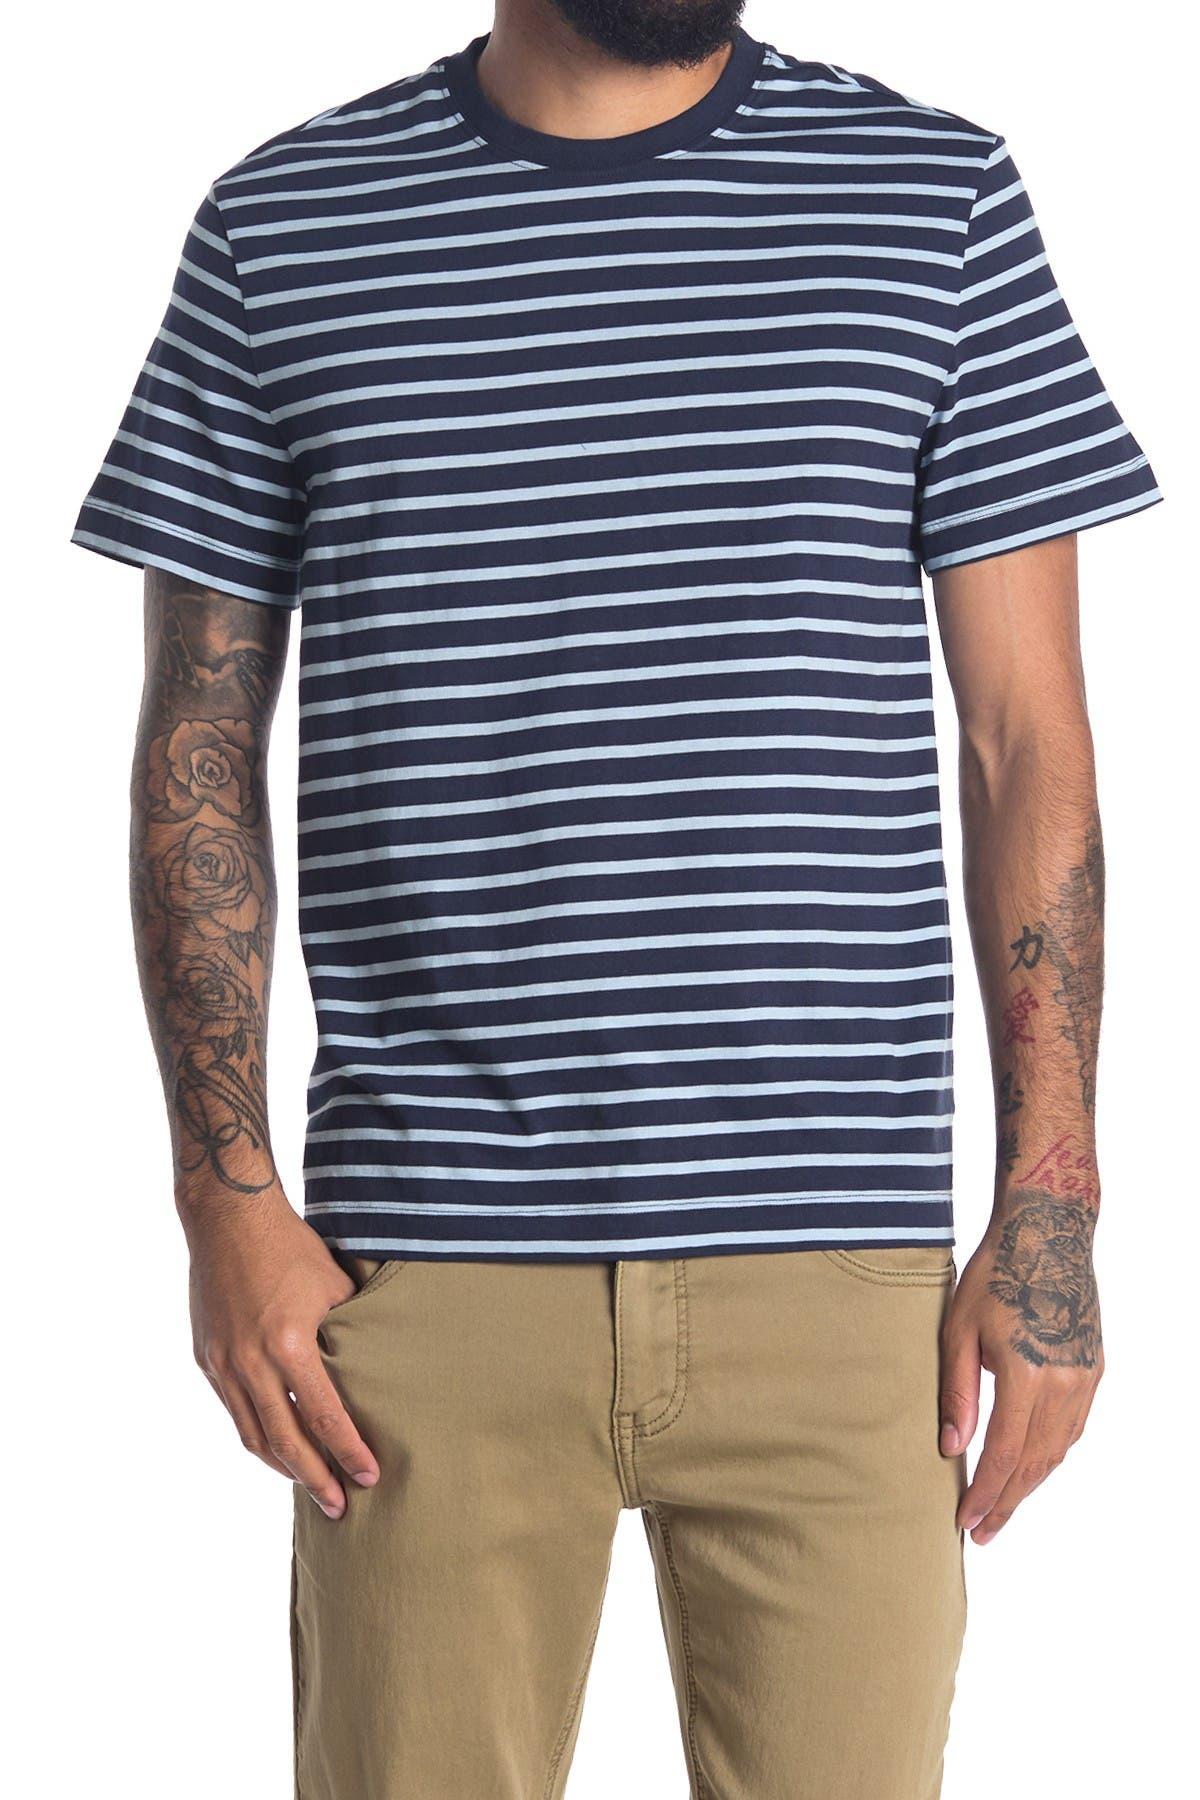 Image of DKNY Feeder Stripe T-Shirt